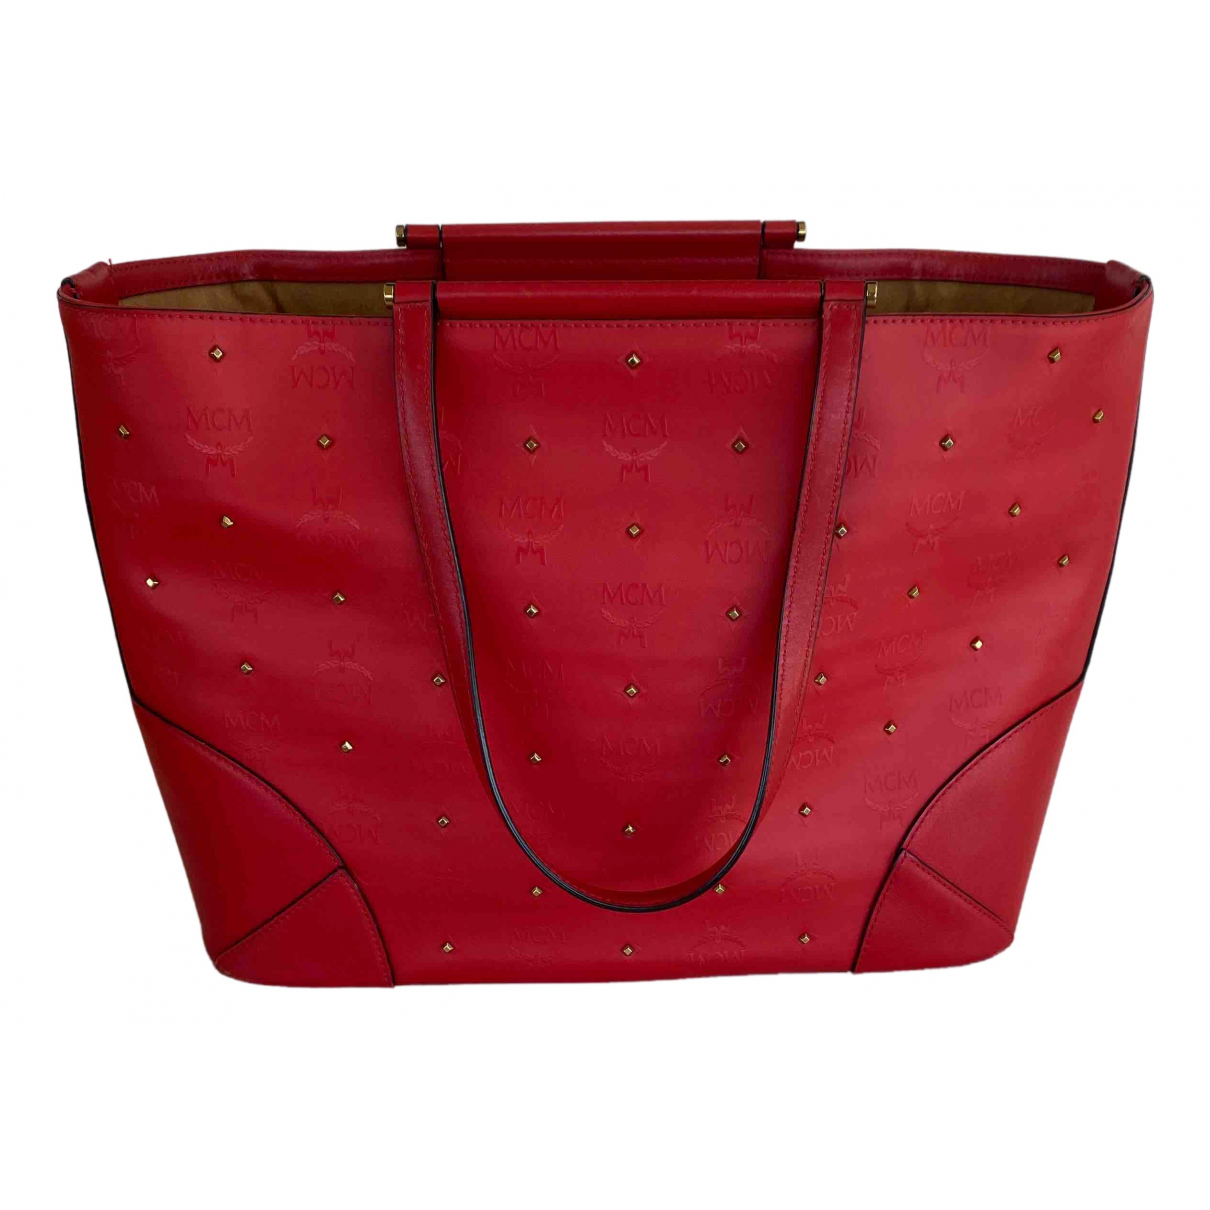 Mcm Anya Red Leather handbag for Women \N